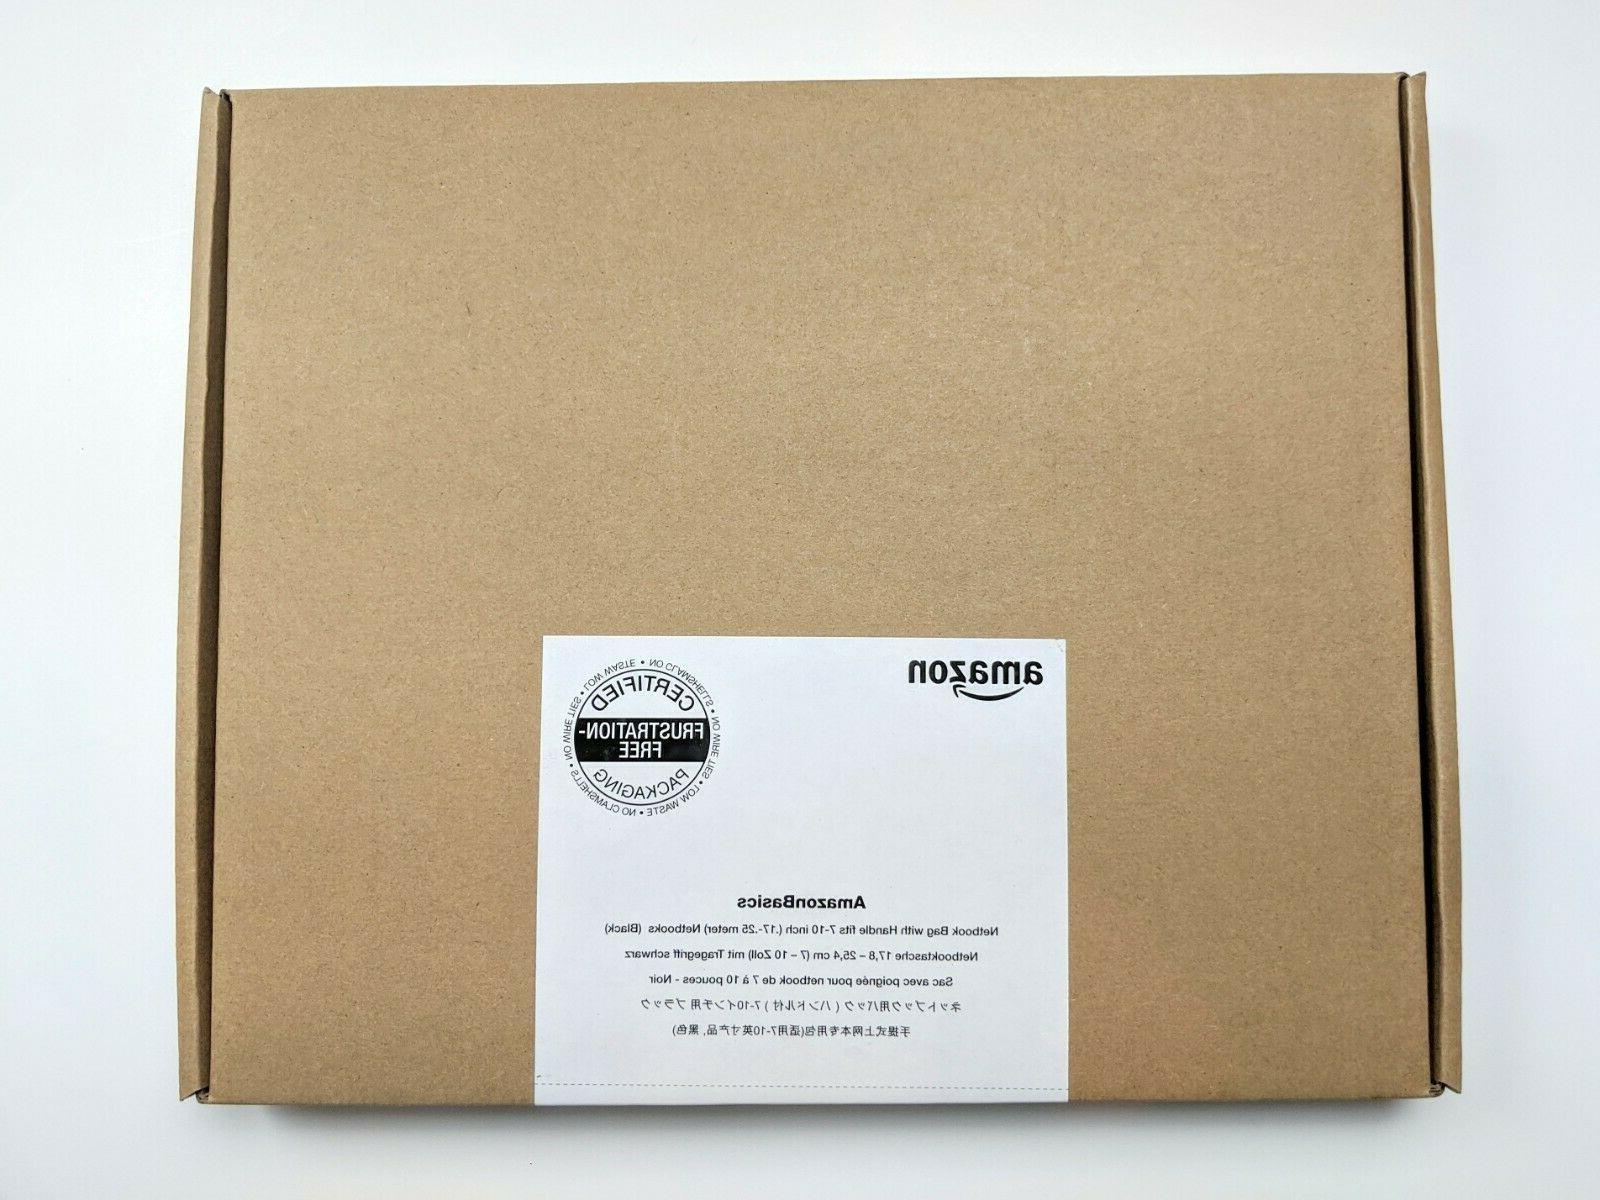 AmazonBasics Air Netbook Bag Fits Tablets